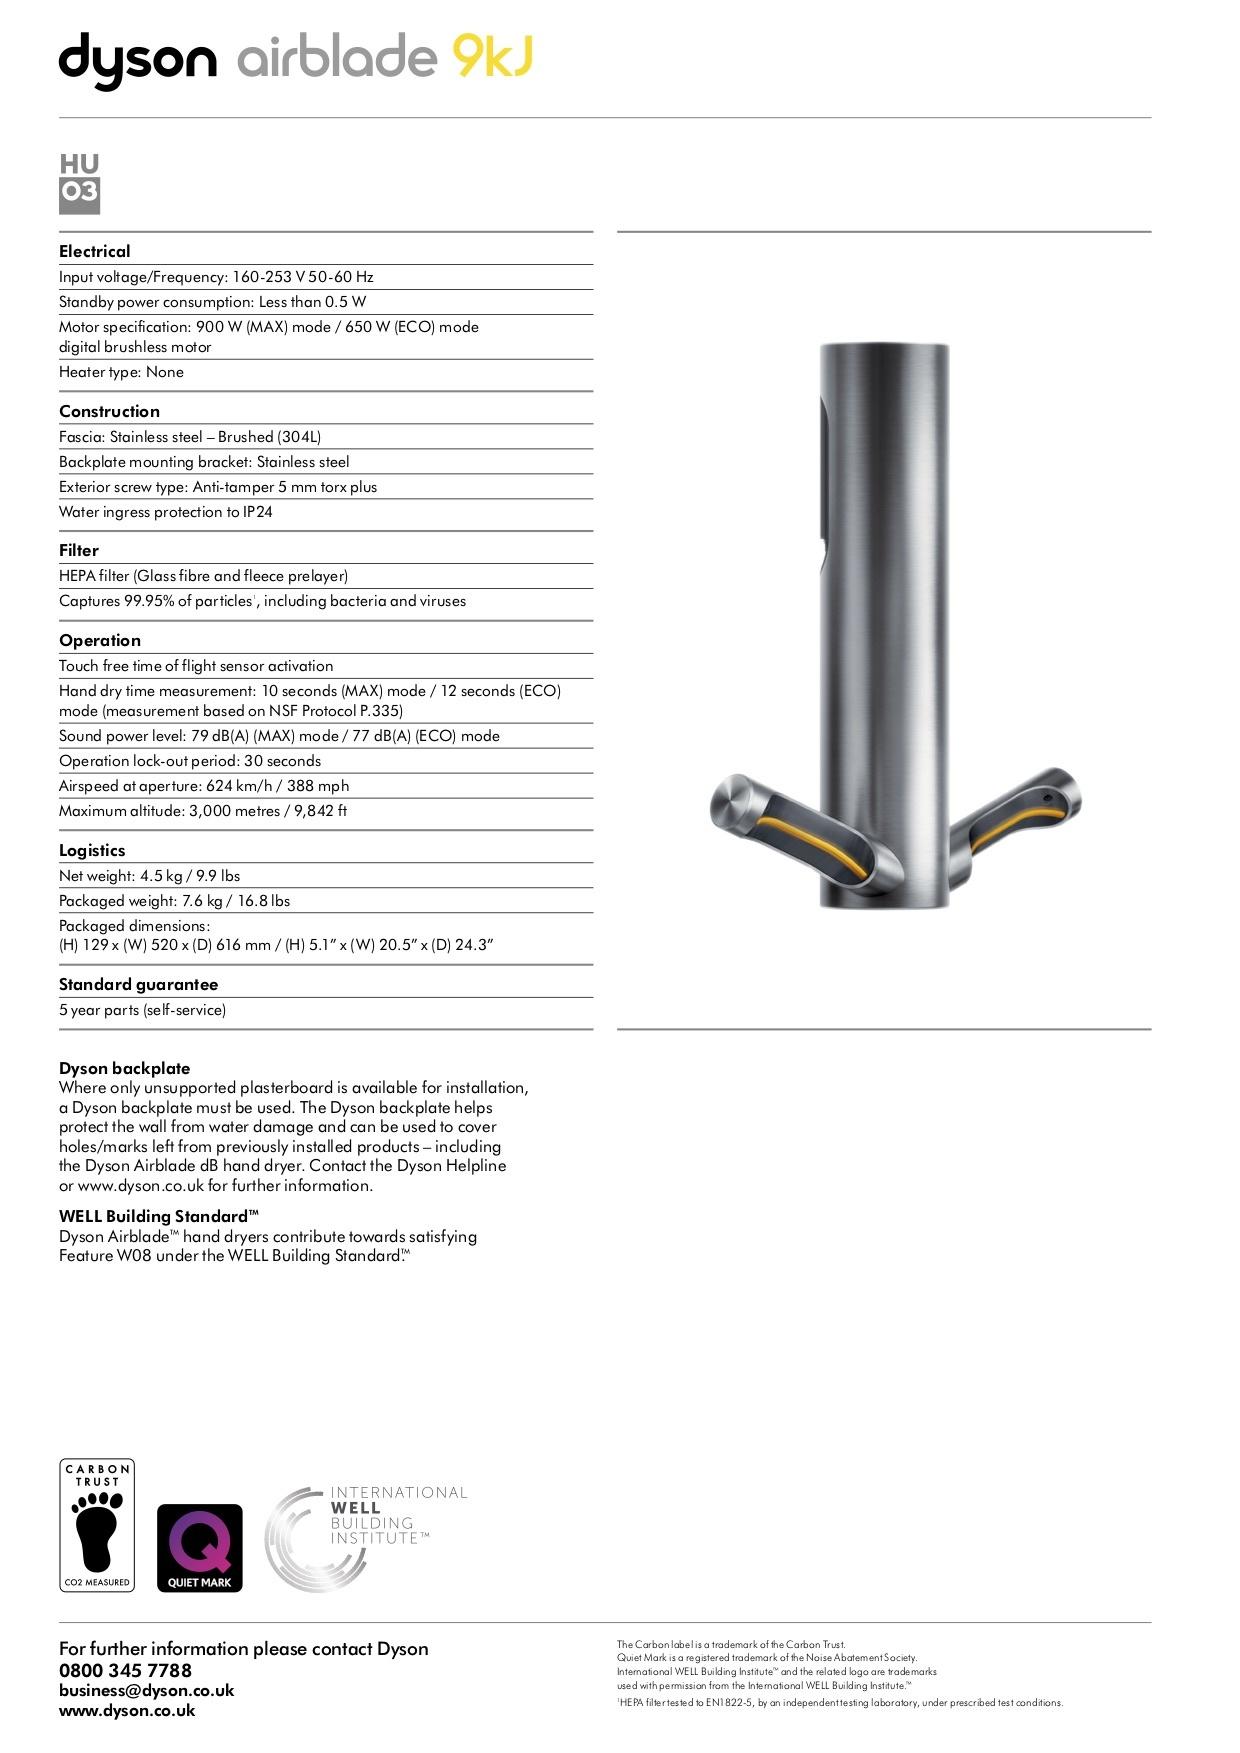 Dyson Airblade 9kj Hand Dryer